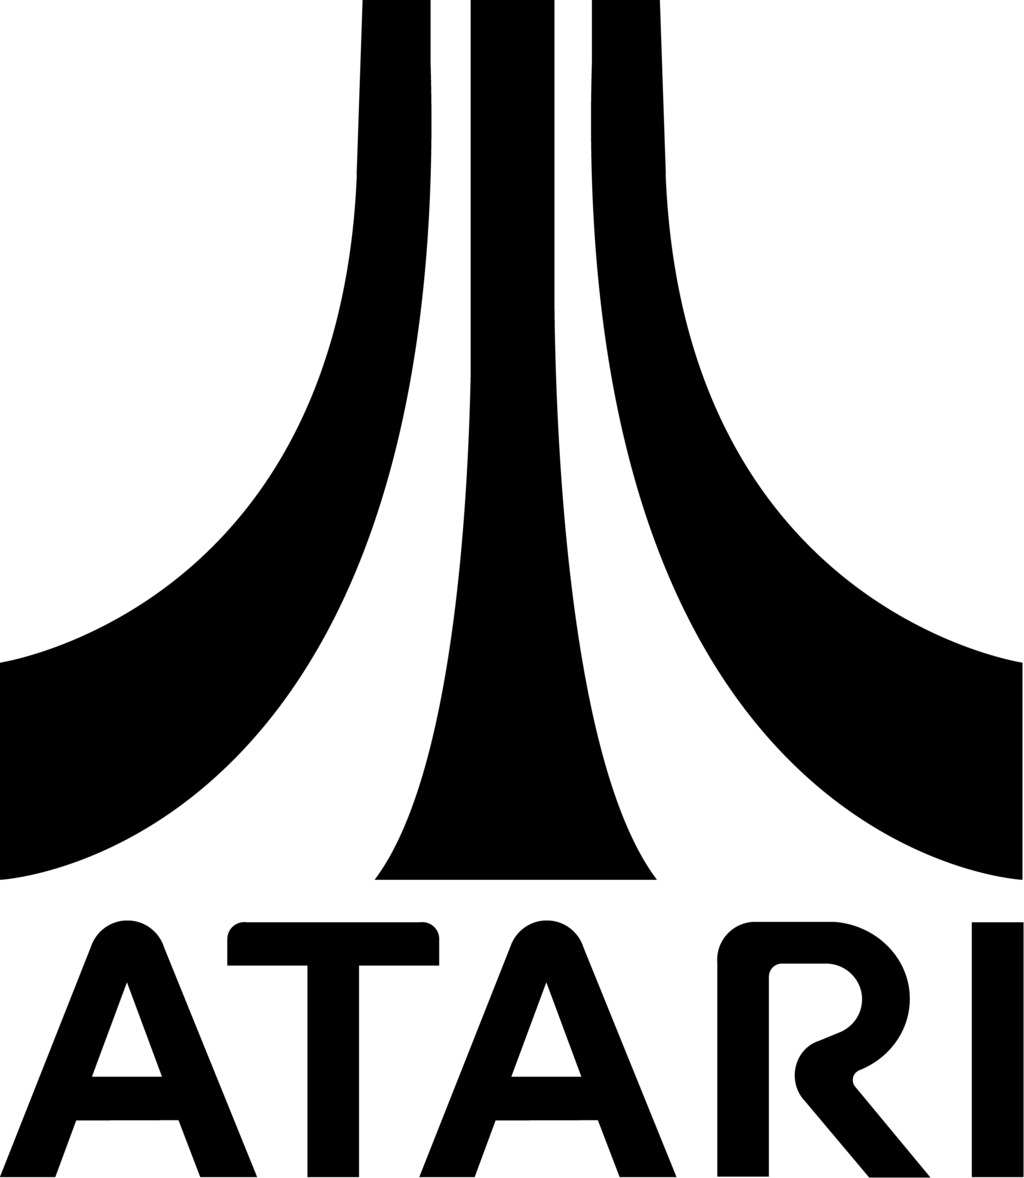 Atari Logo 2 by DHLarson Atari Logo 2 by DHLarson - Atari Games Black Logo Vector PNG